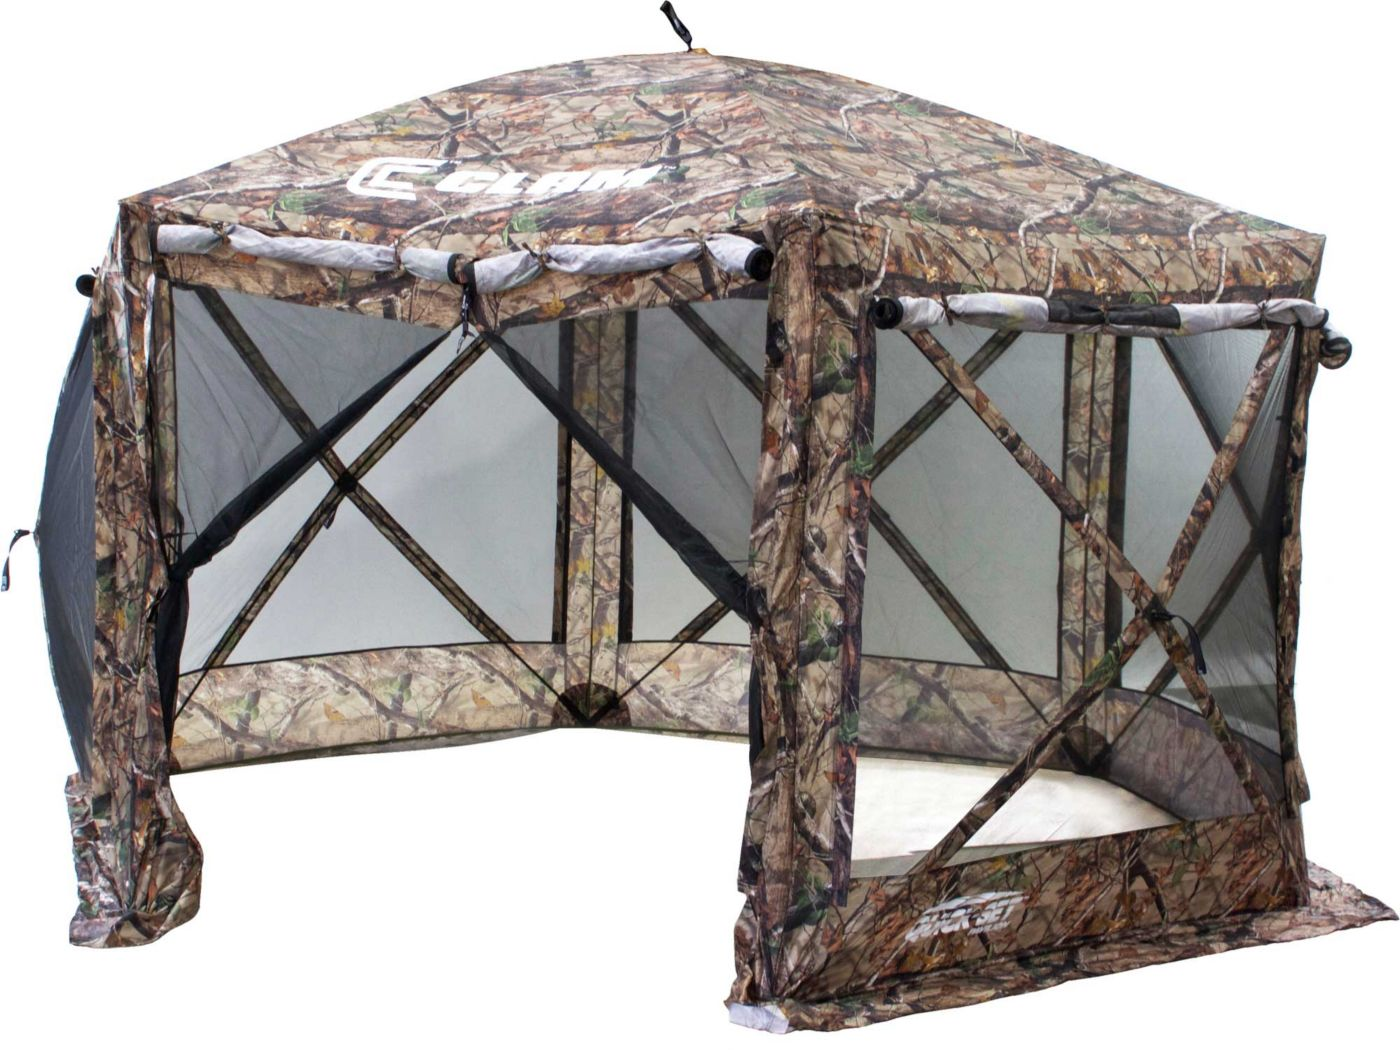 Clam Outdoors 12.5' x 12.5' Quick-Set Pavilion Screen House